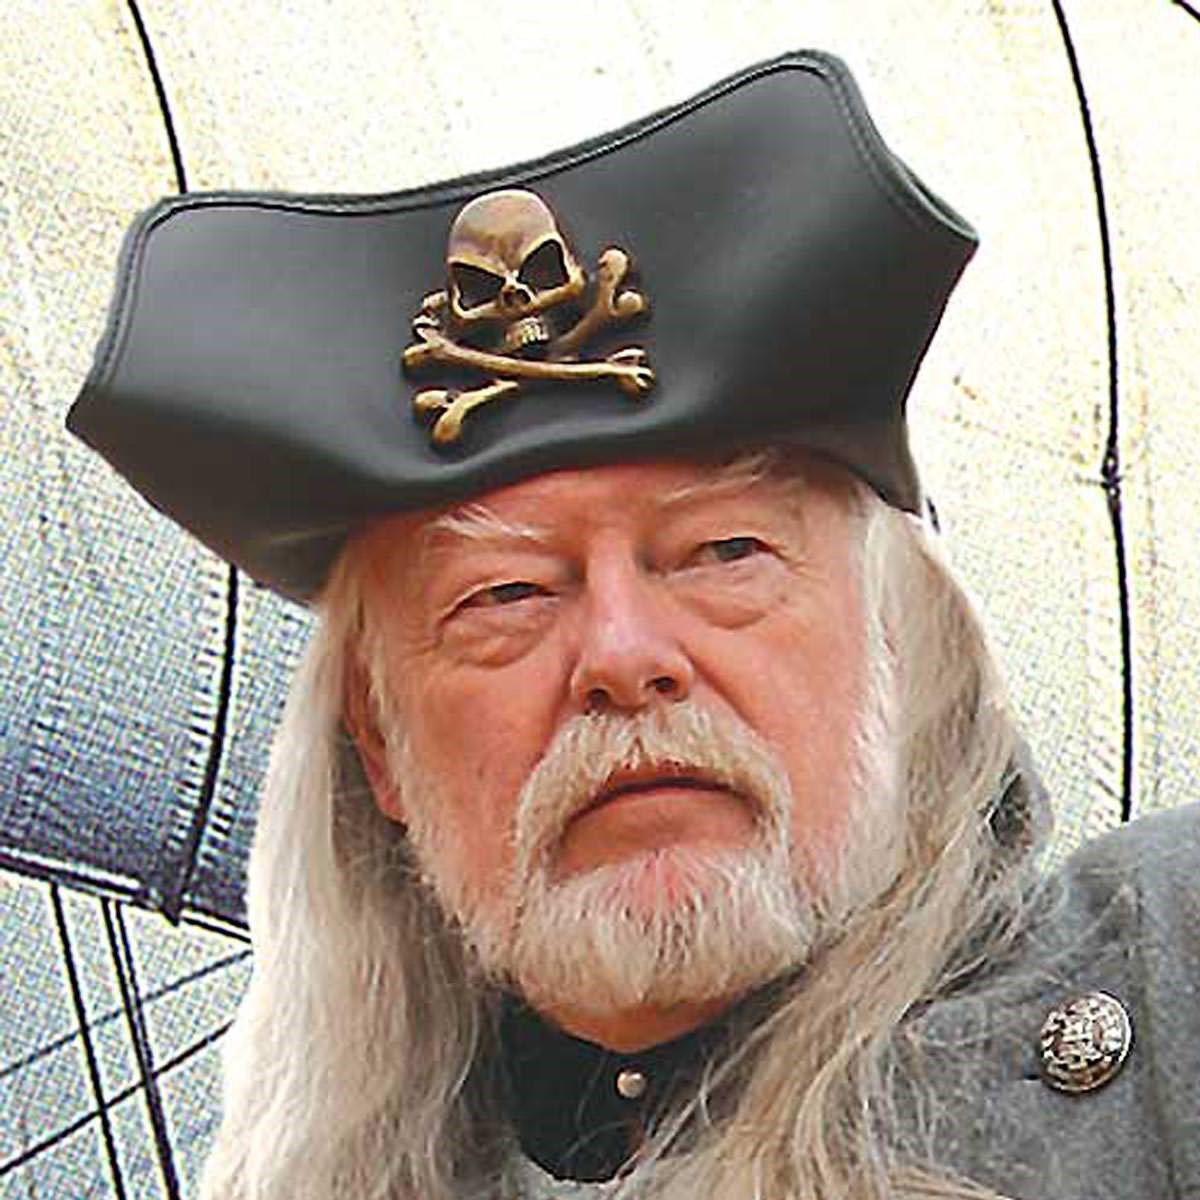 Skull & Crossbones Tricorn Leather Hat